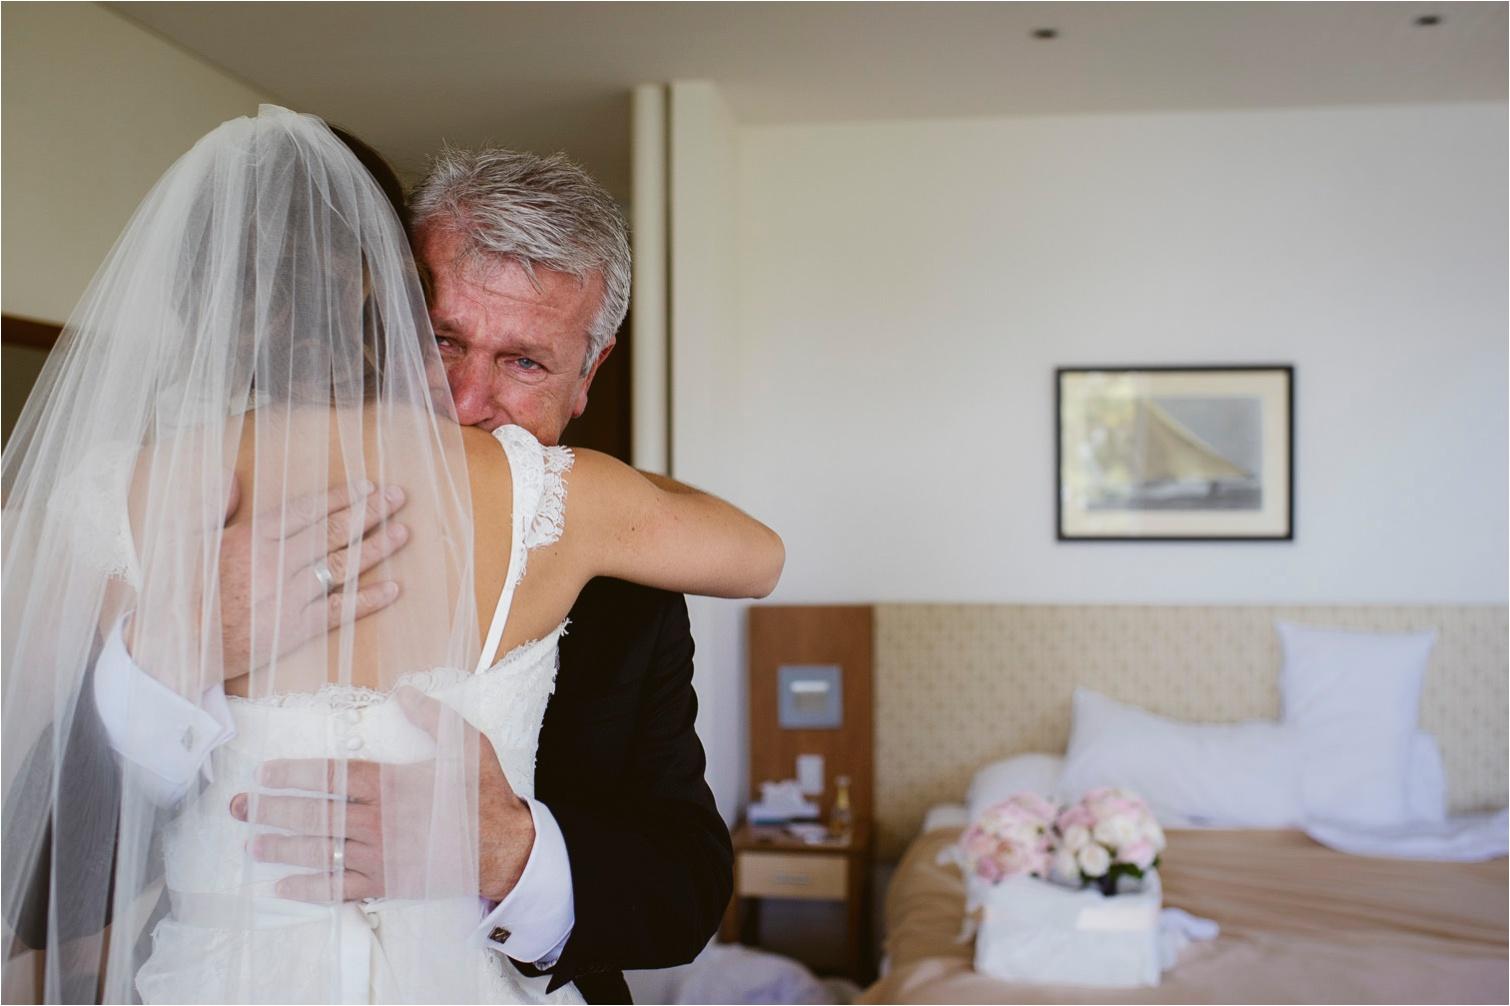 Nicole&Carlie_Watsons_Bay_Hotel_Wedding_by_Gold_Coast_Photographers-The_Follans9.jpg